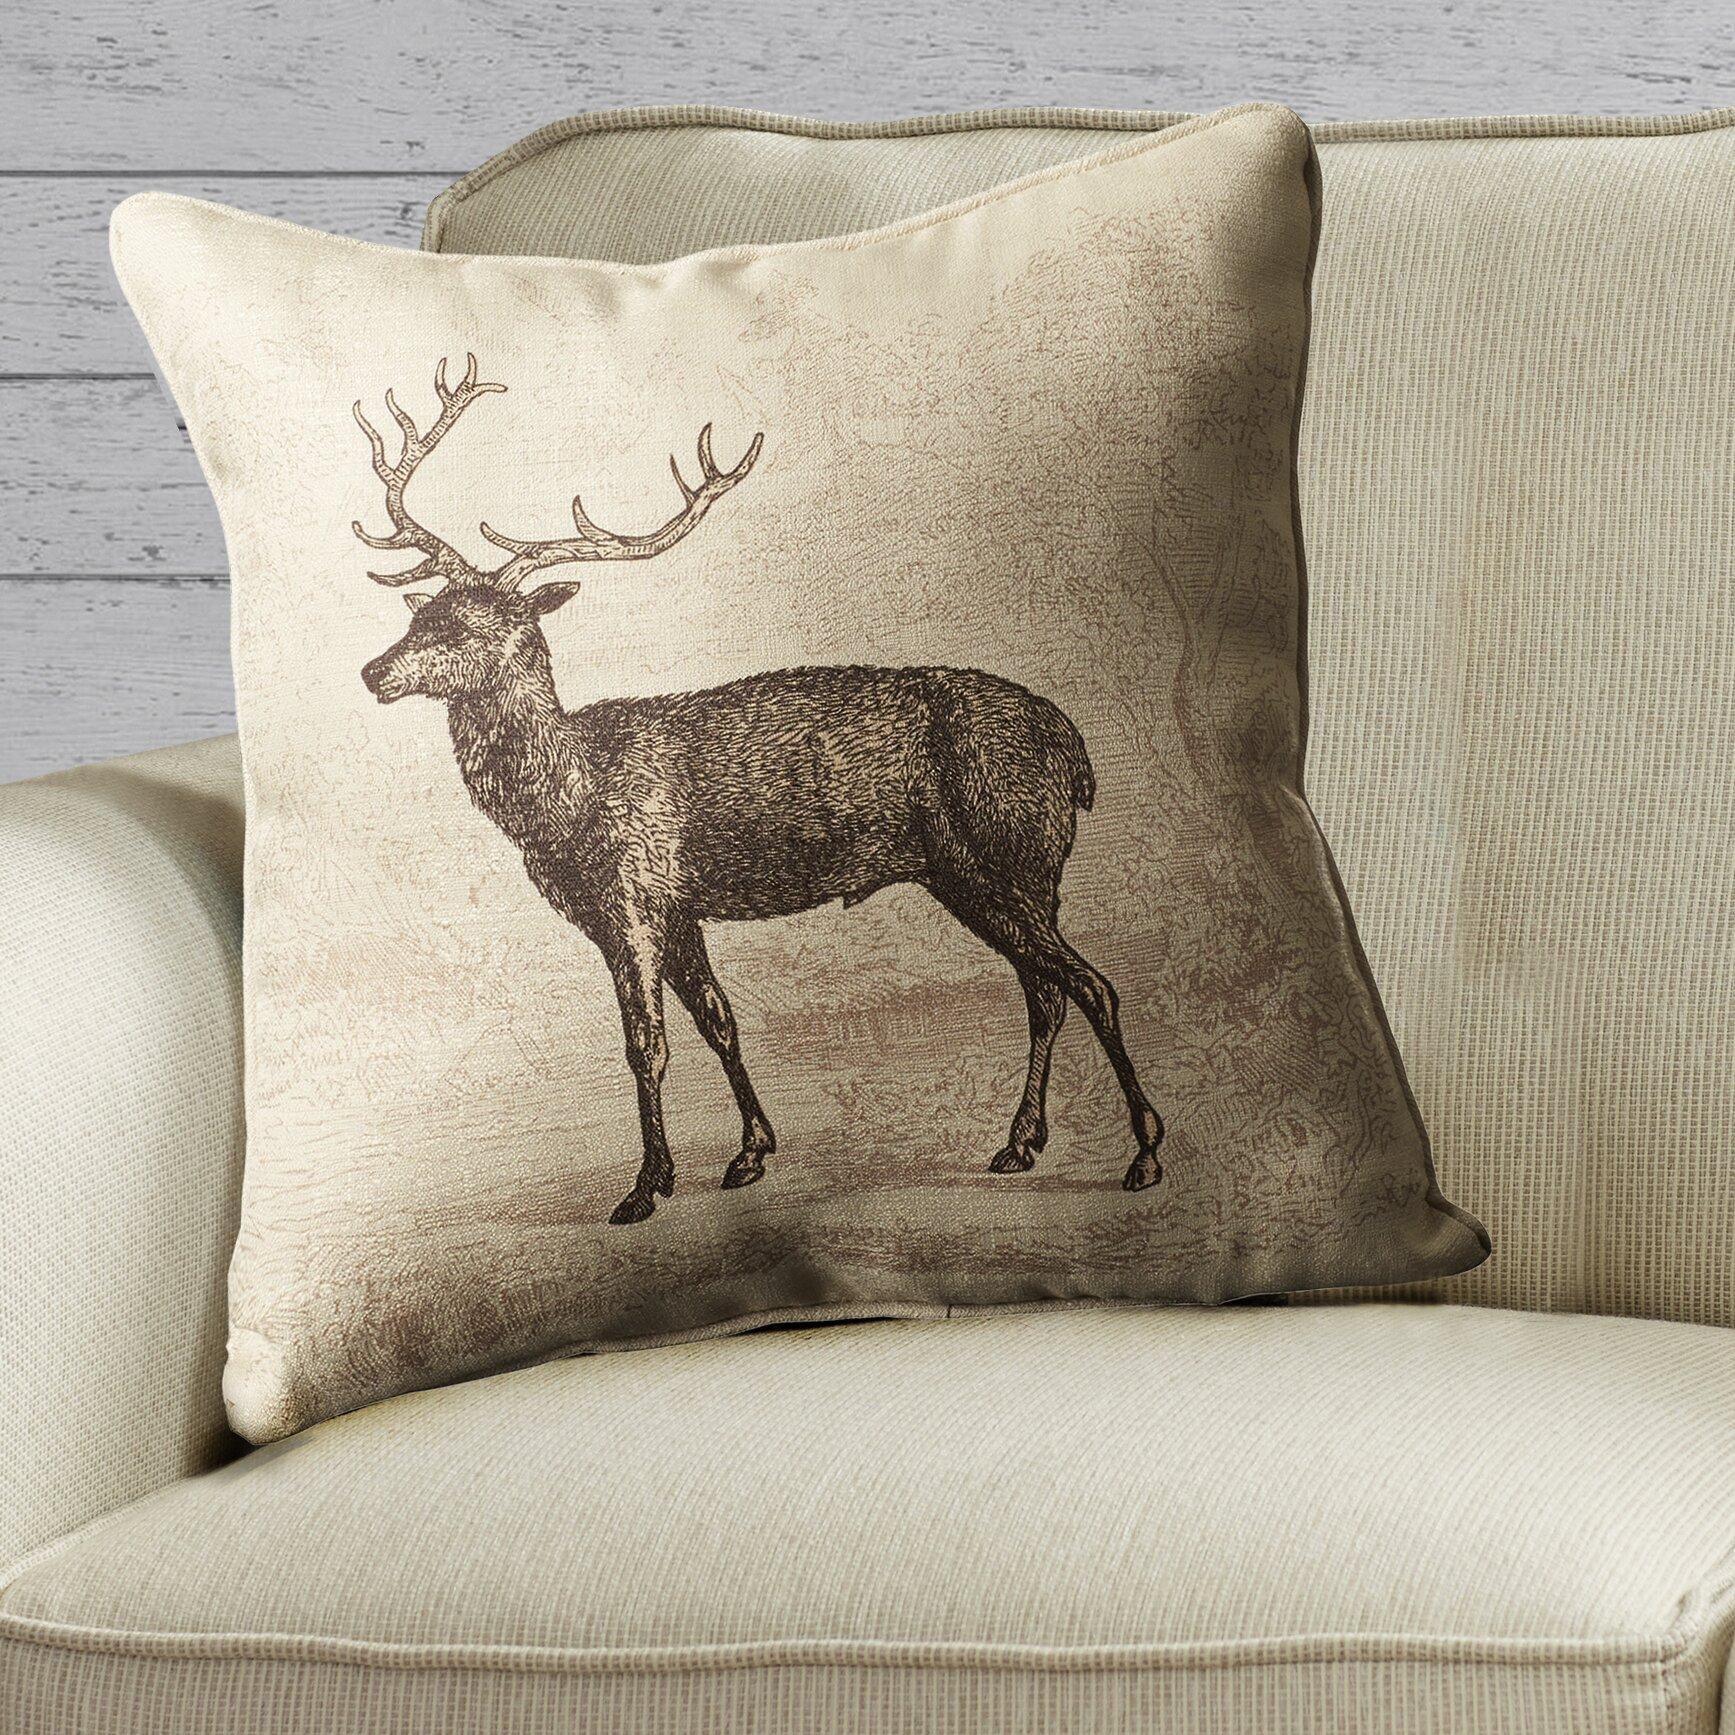 Throw Pillows With Deer : lava Lava Deer Etching Throw Pillow & Reviews Wayfair